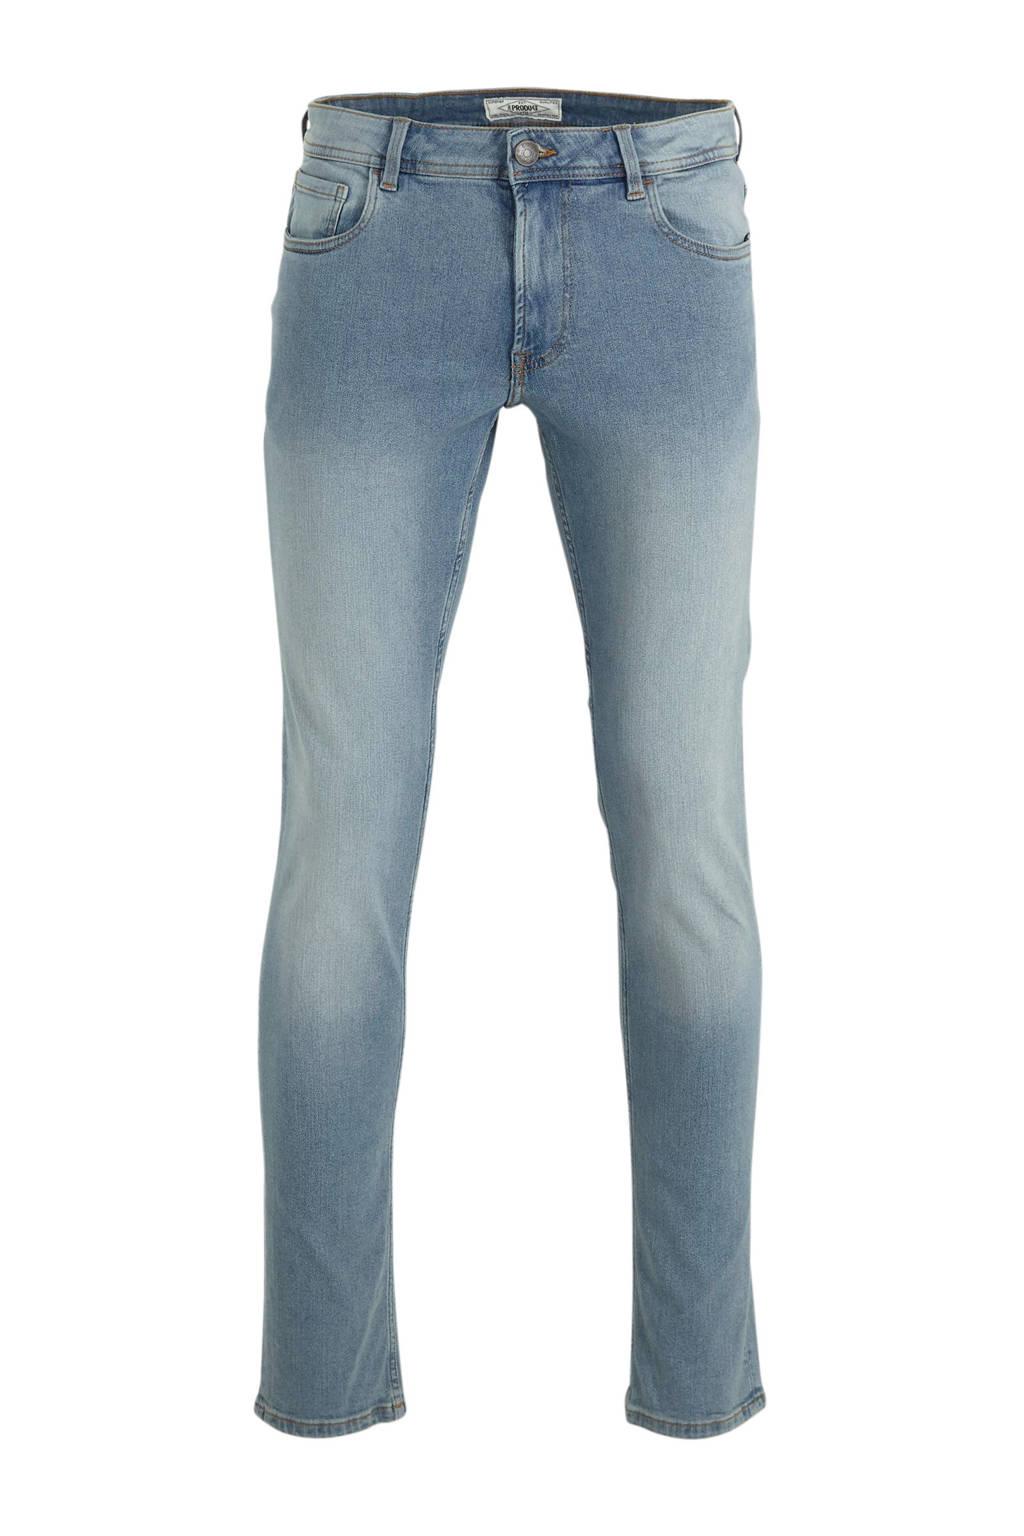 PRODUKT skinny jeans Pktakm grijs, Grijs